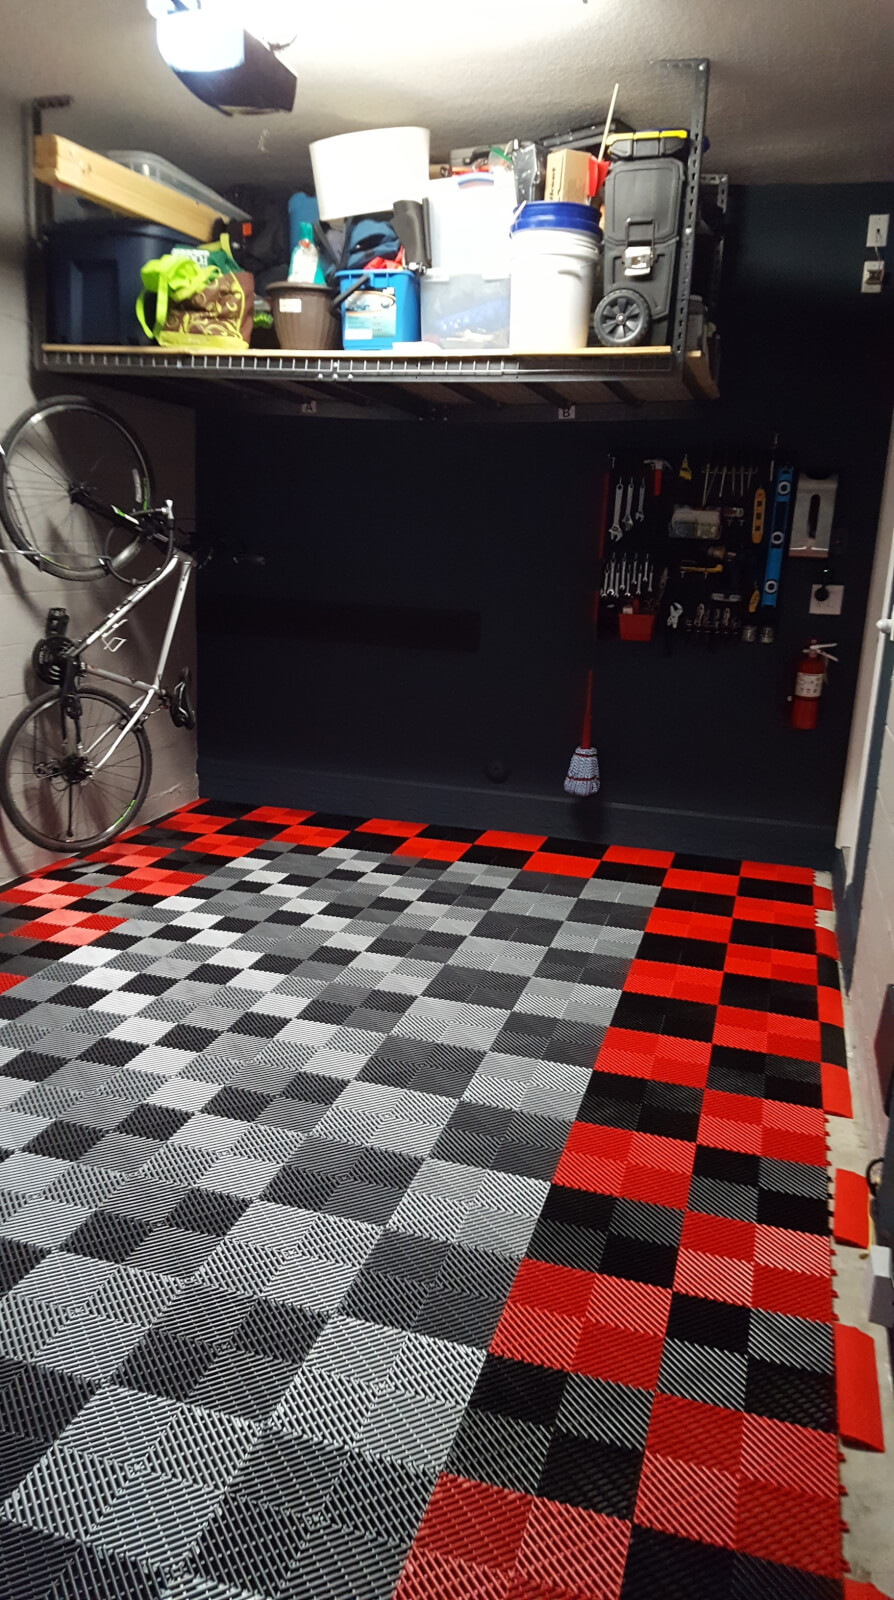 duplex bedroom bq detached attached rm type luxury pent master g house floor rooms project